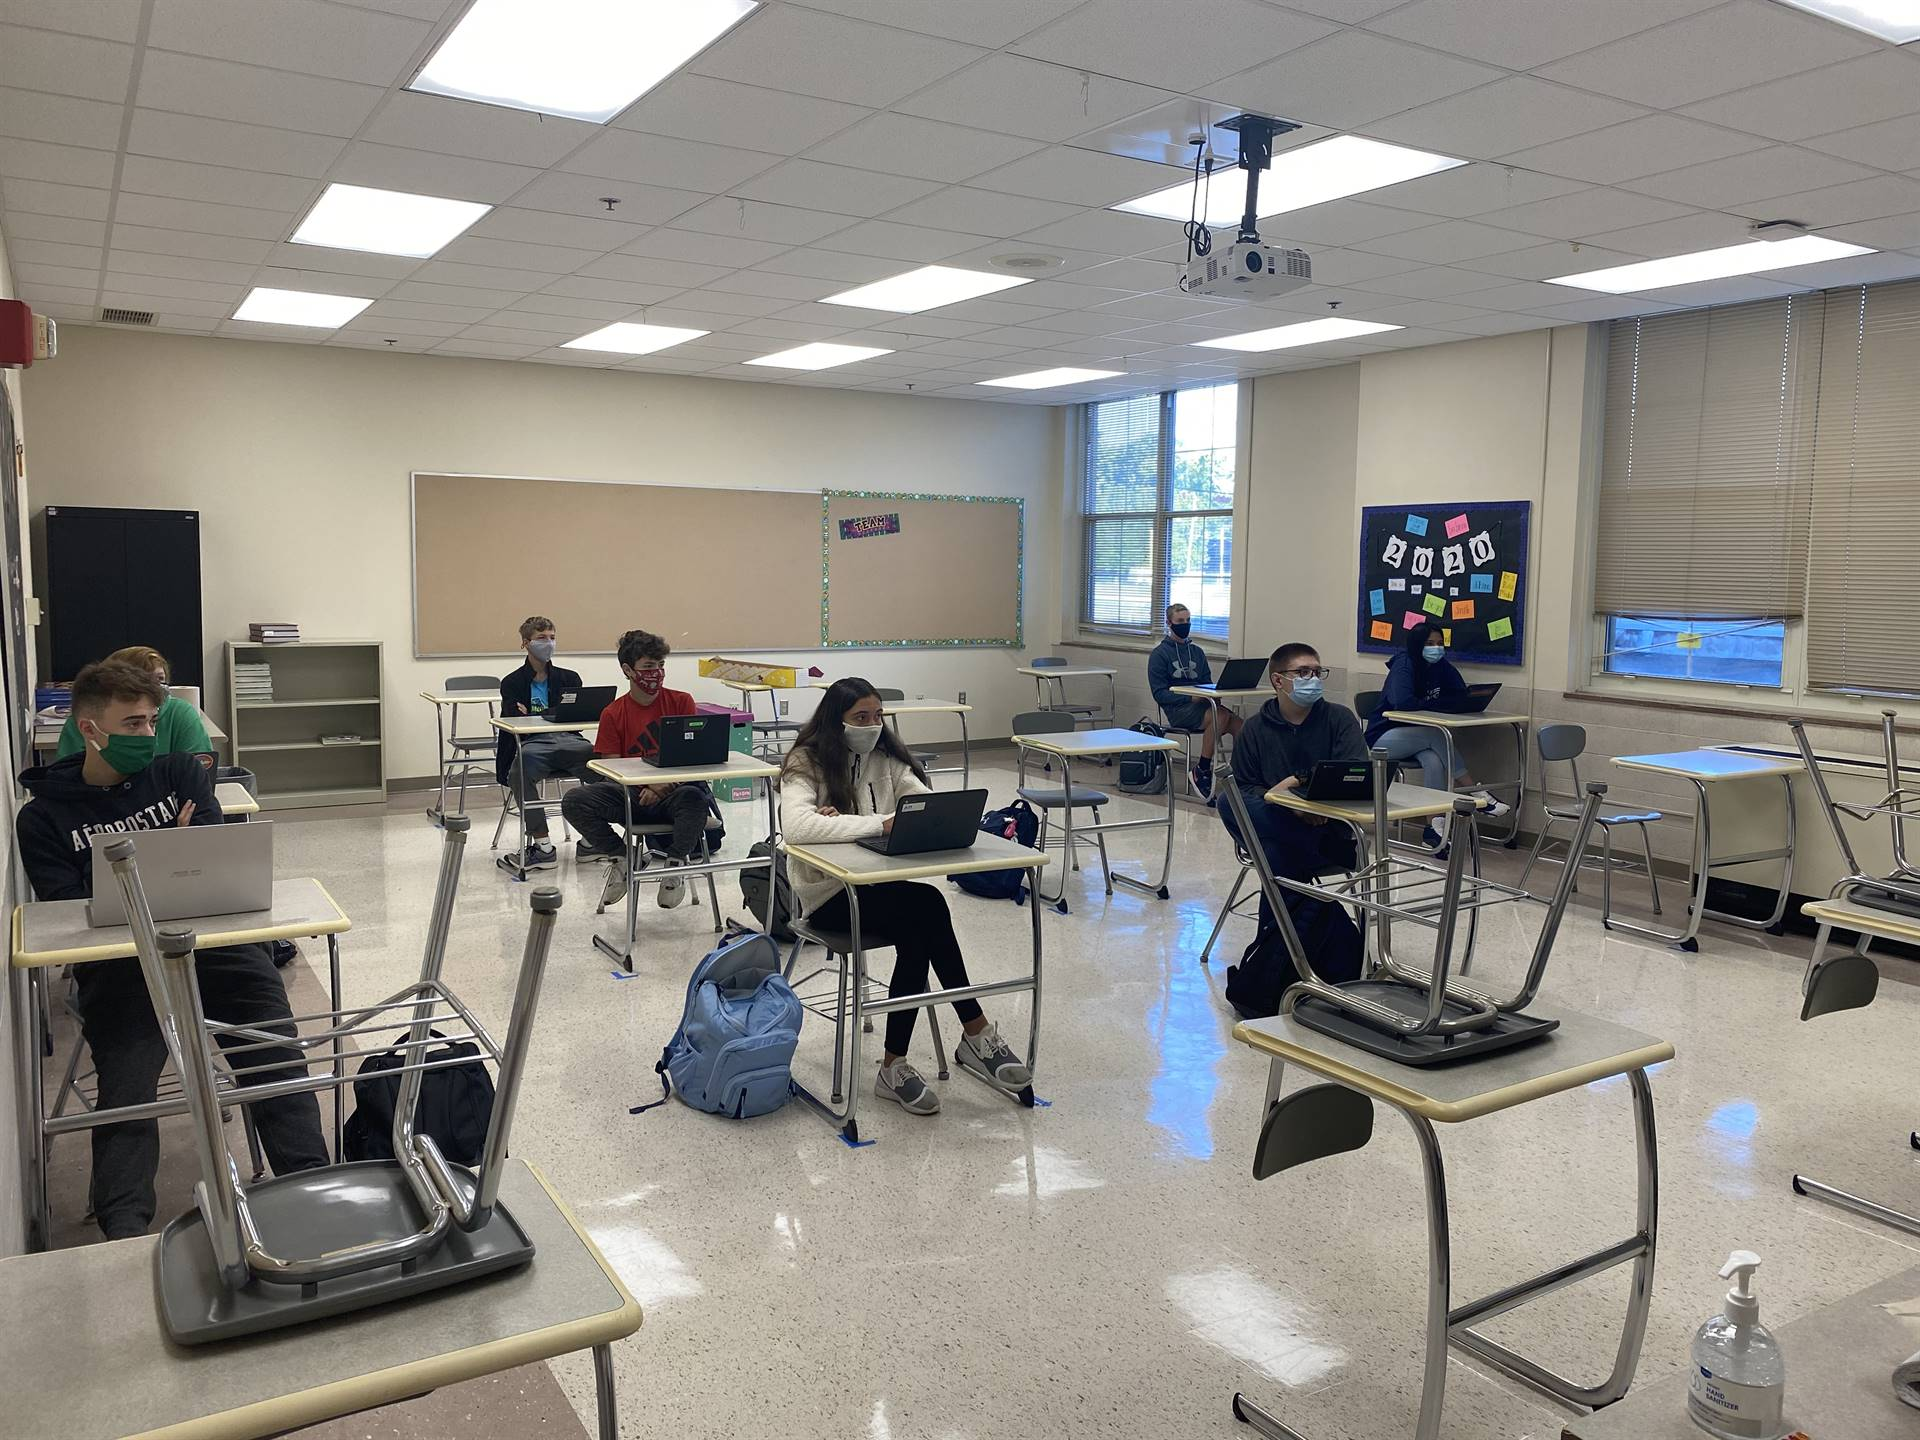 Classroom 2020